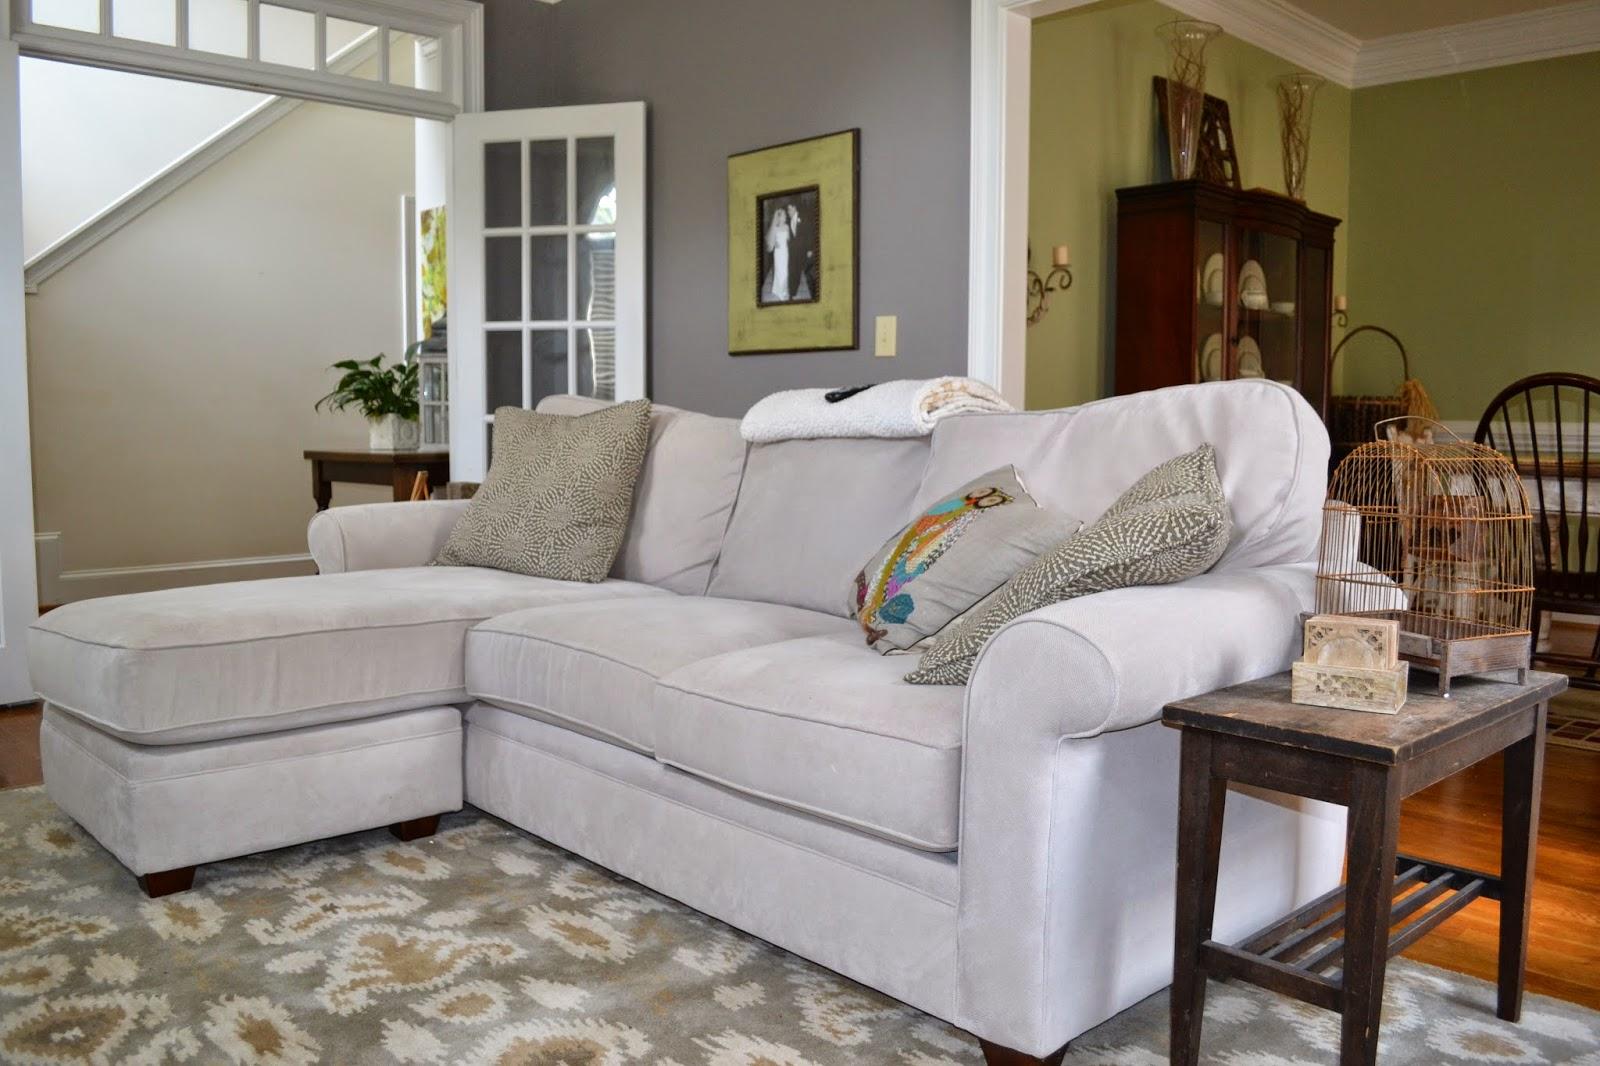 ballard design rugs - rugs ideas